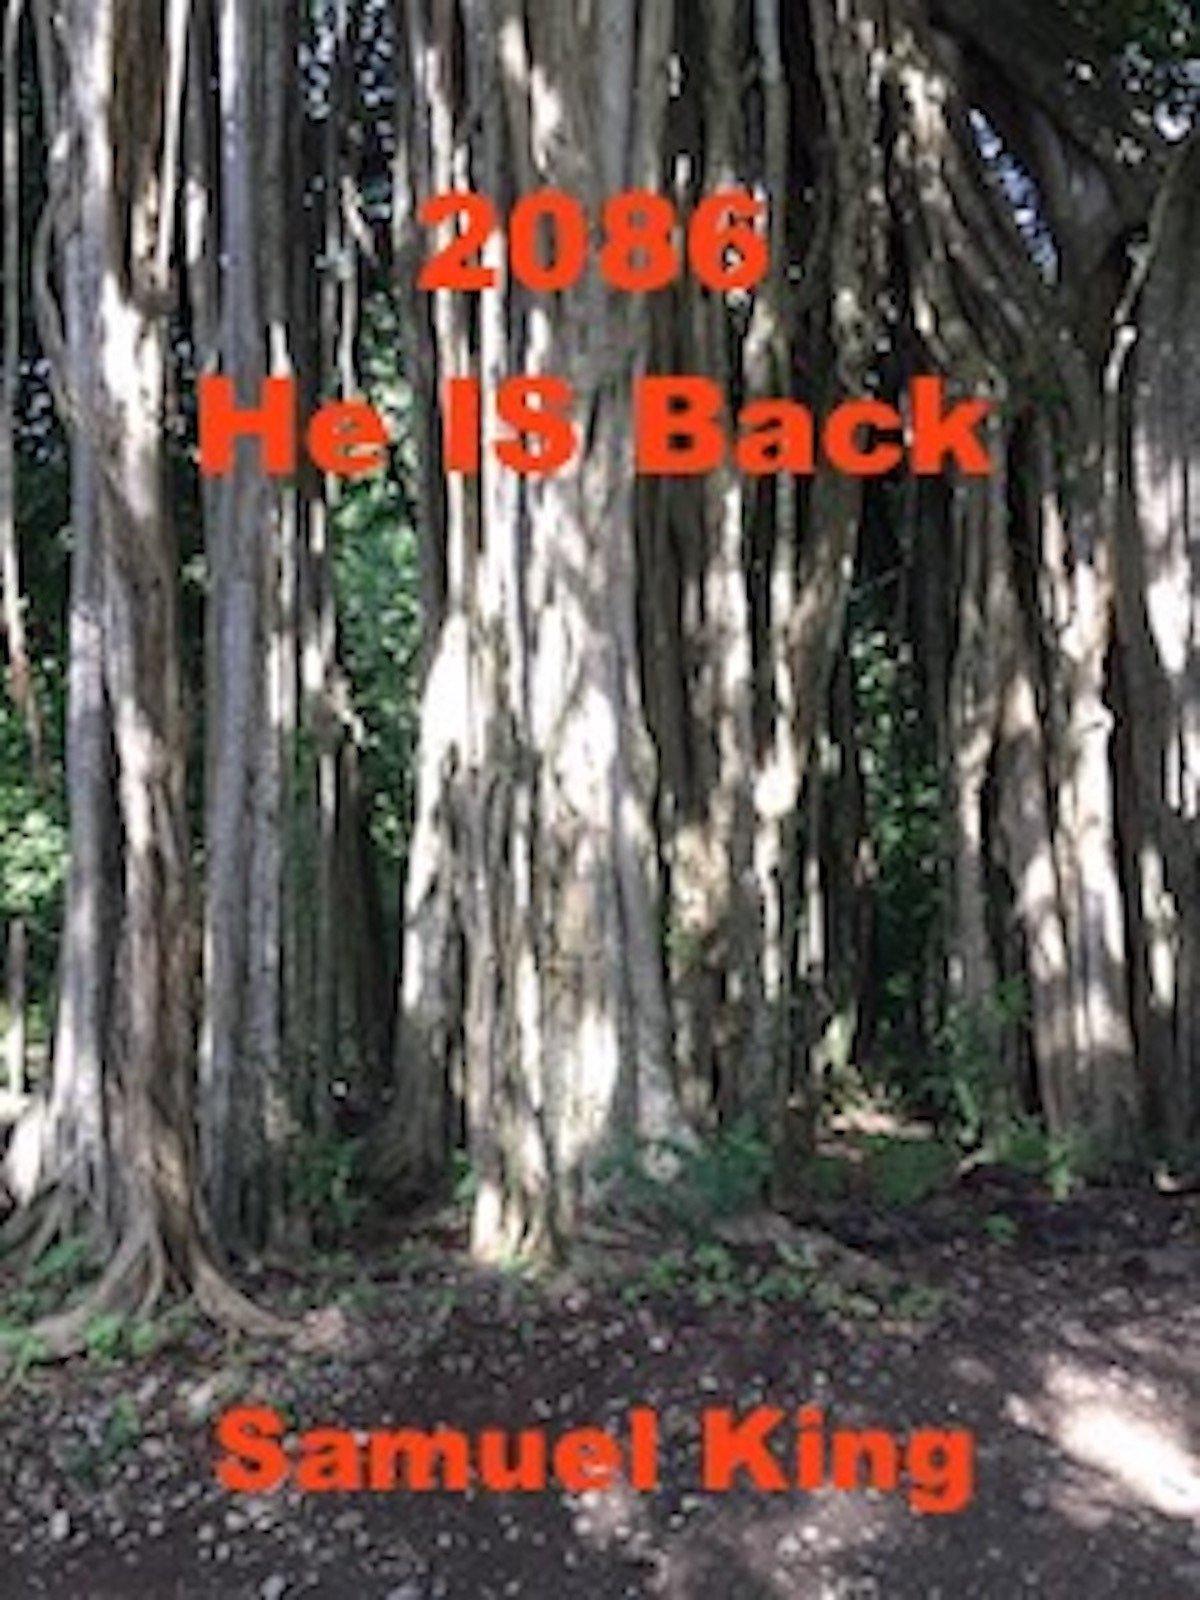 2086, He Is Back